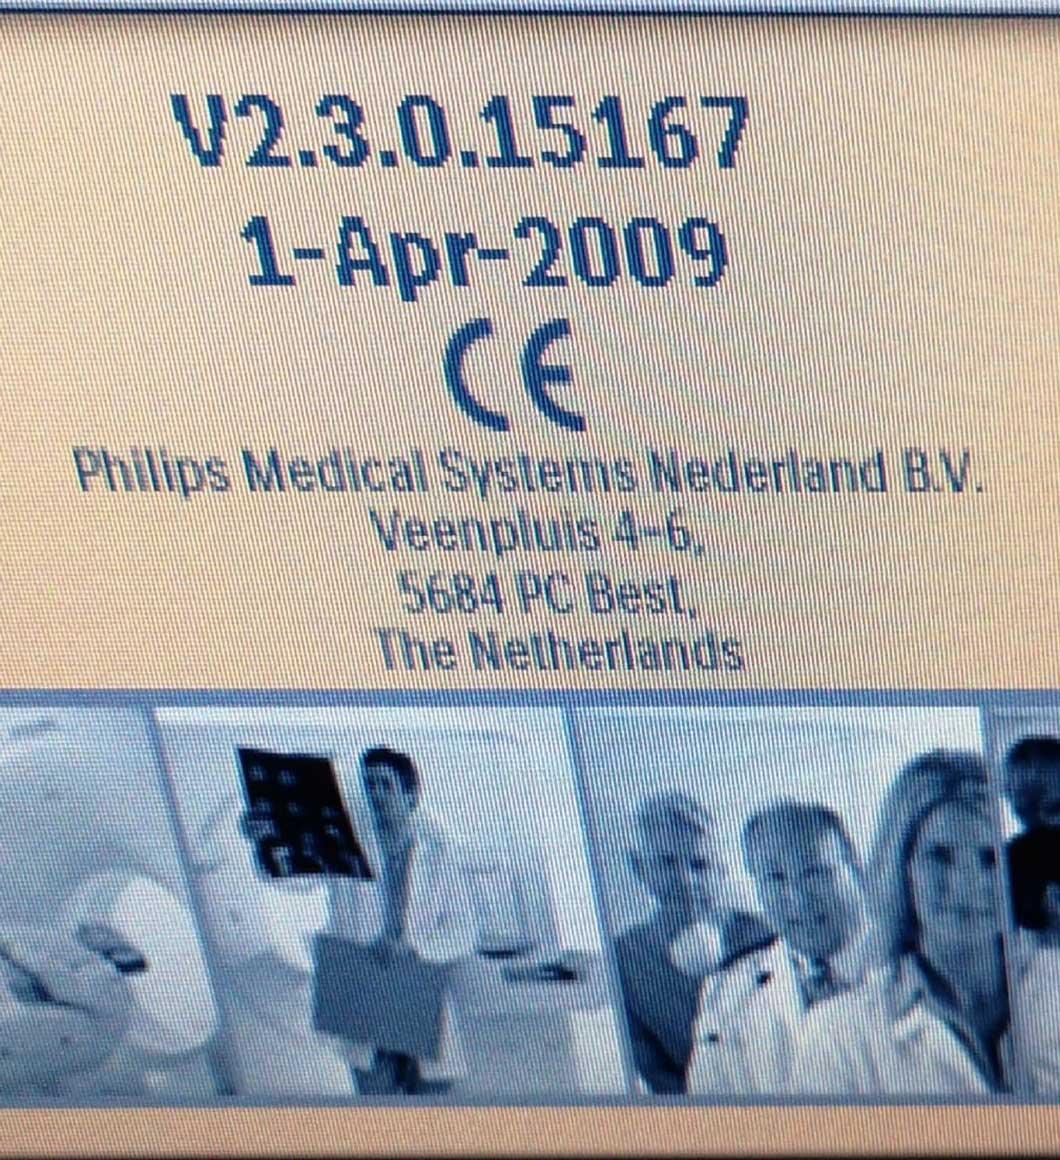 2006 Philips Brilliance 40 CT